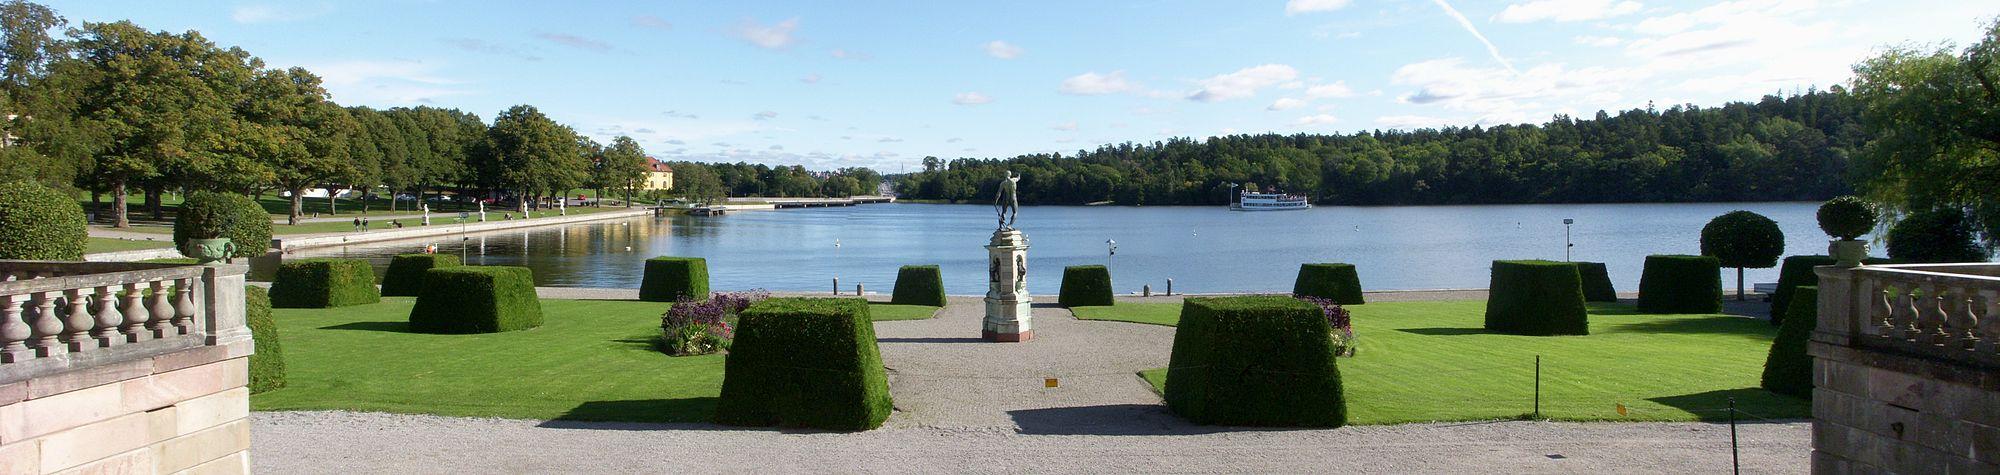 Drottningholms slott   wikiwand